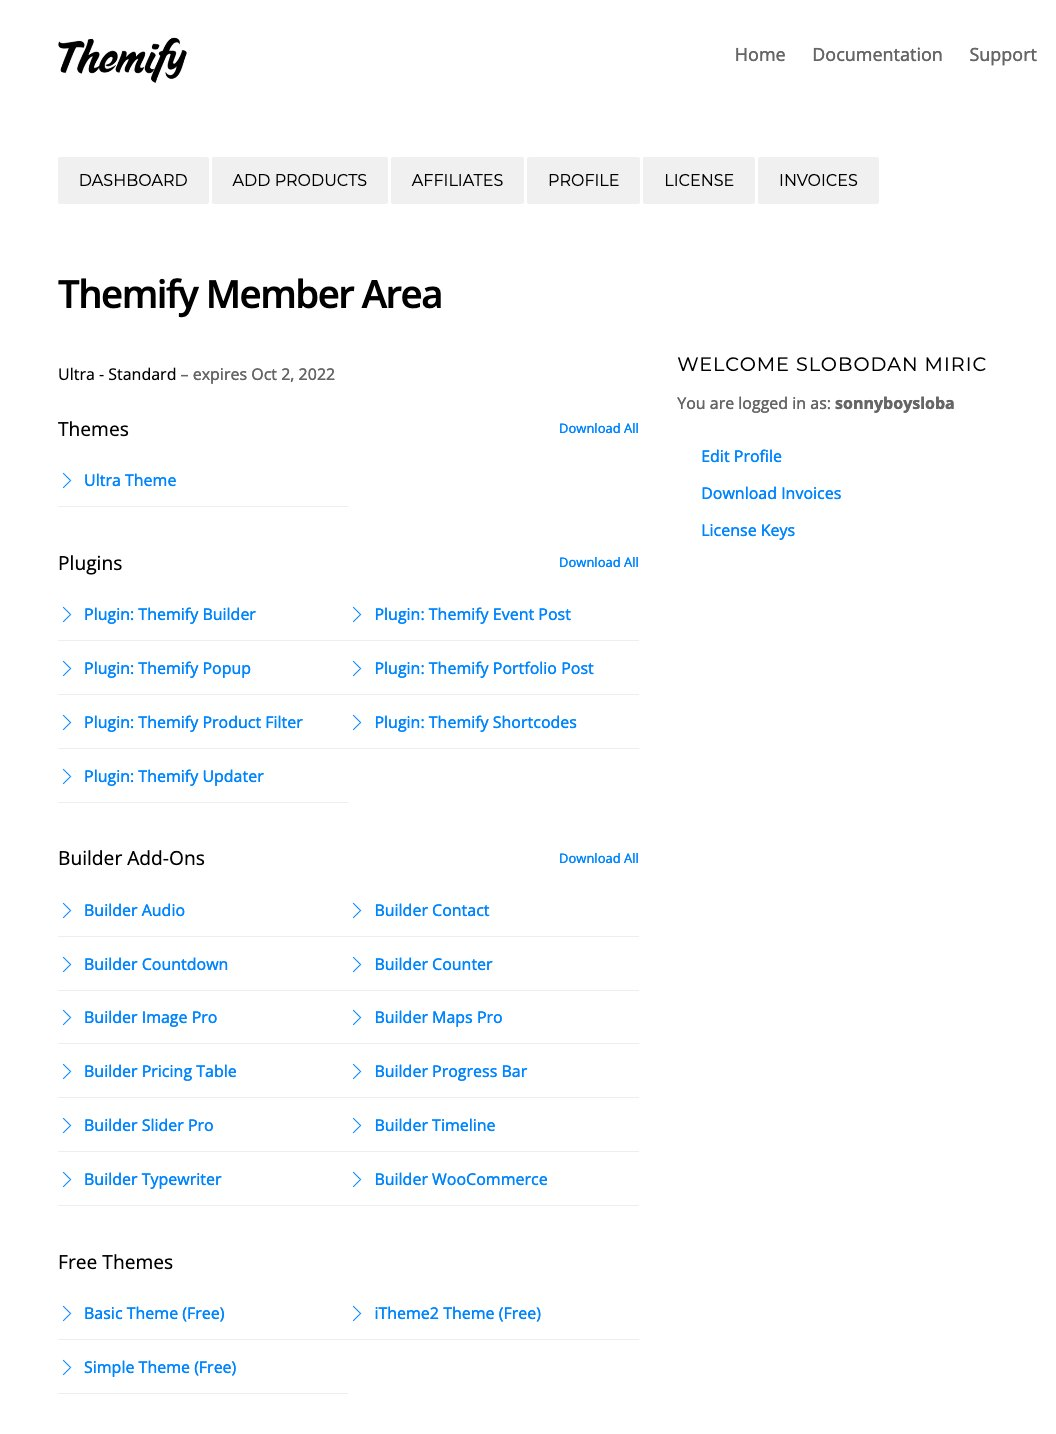 Screenshot 2021-10-03 at 11-42-50 Themify Member Area